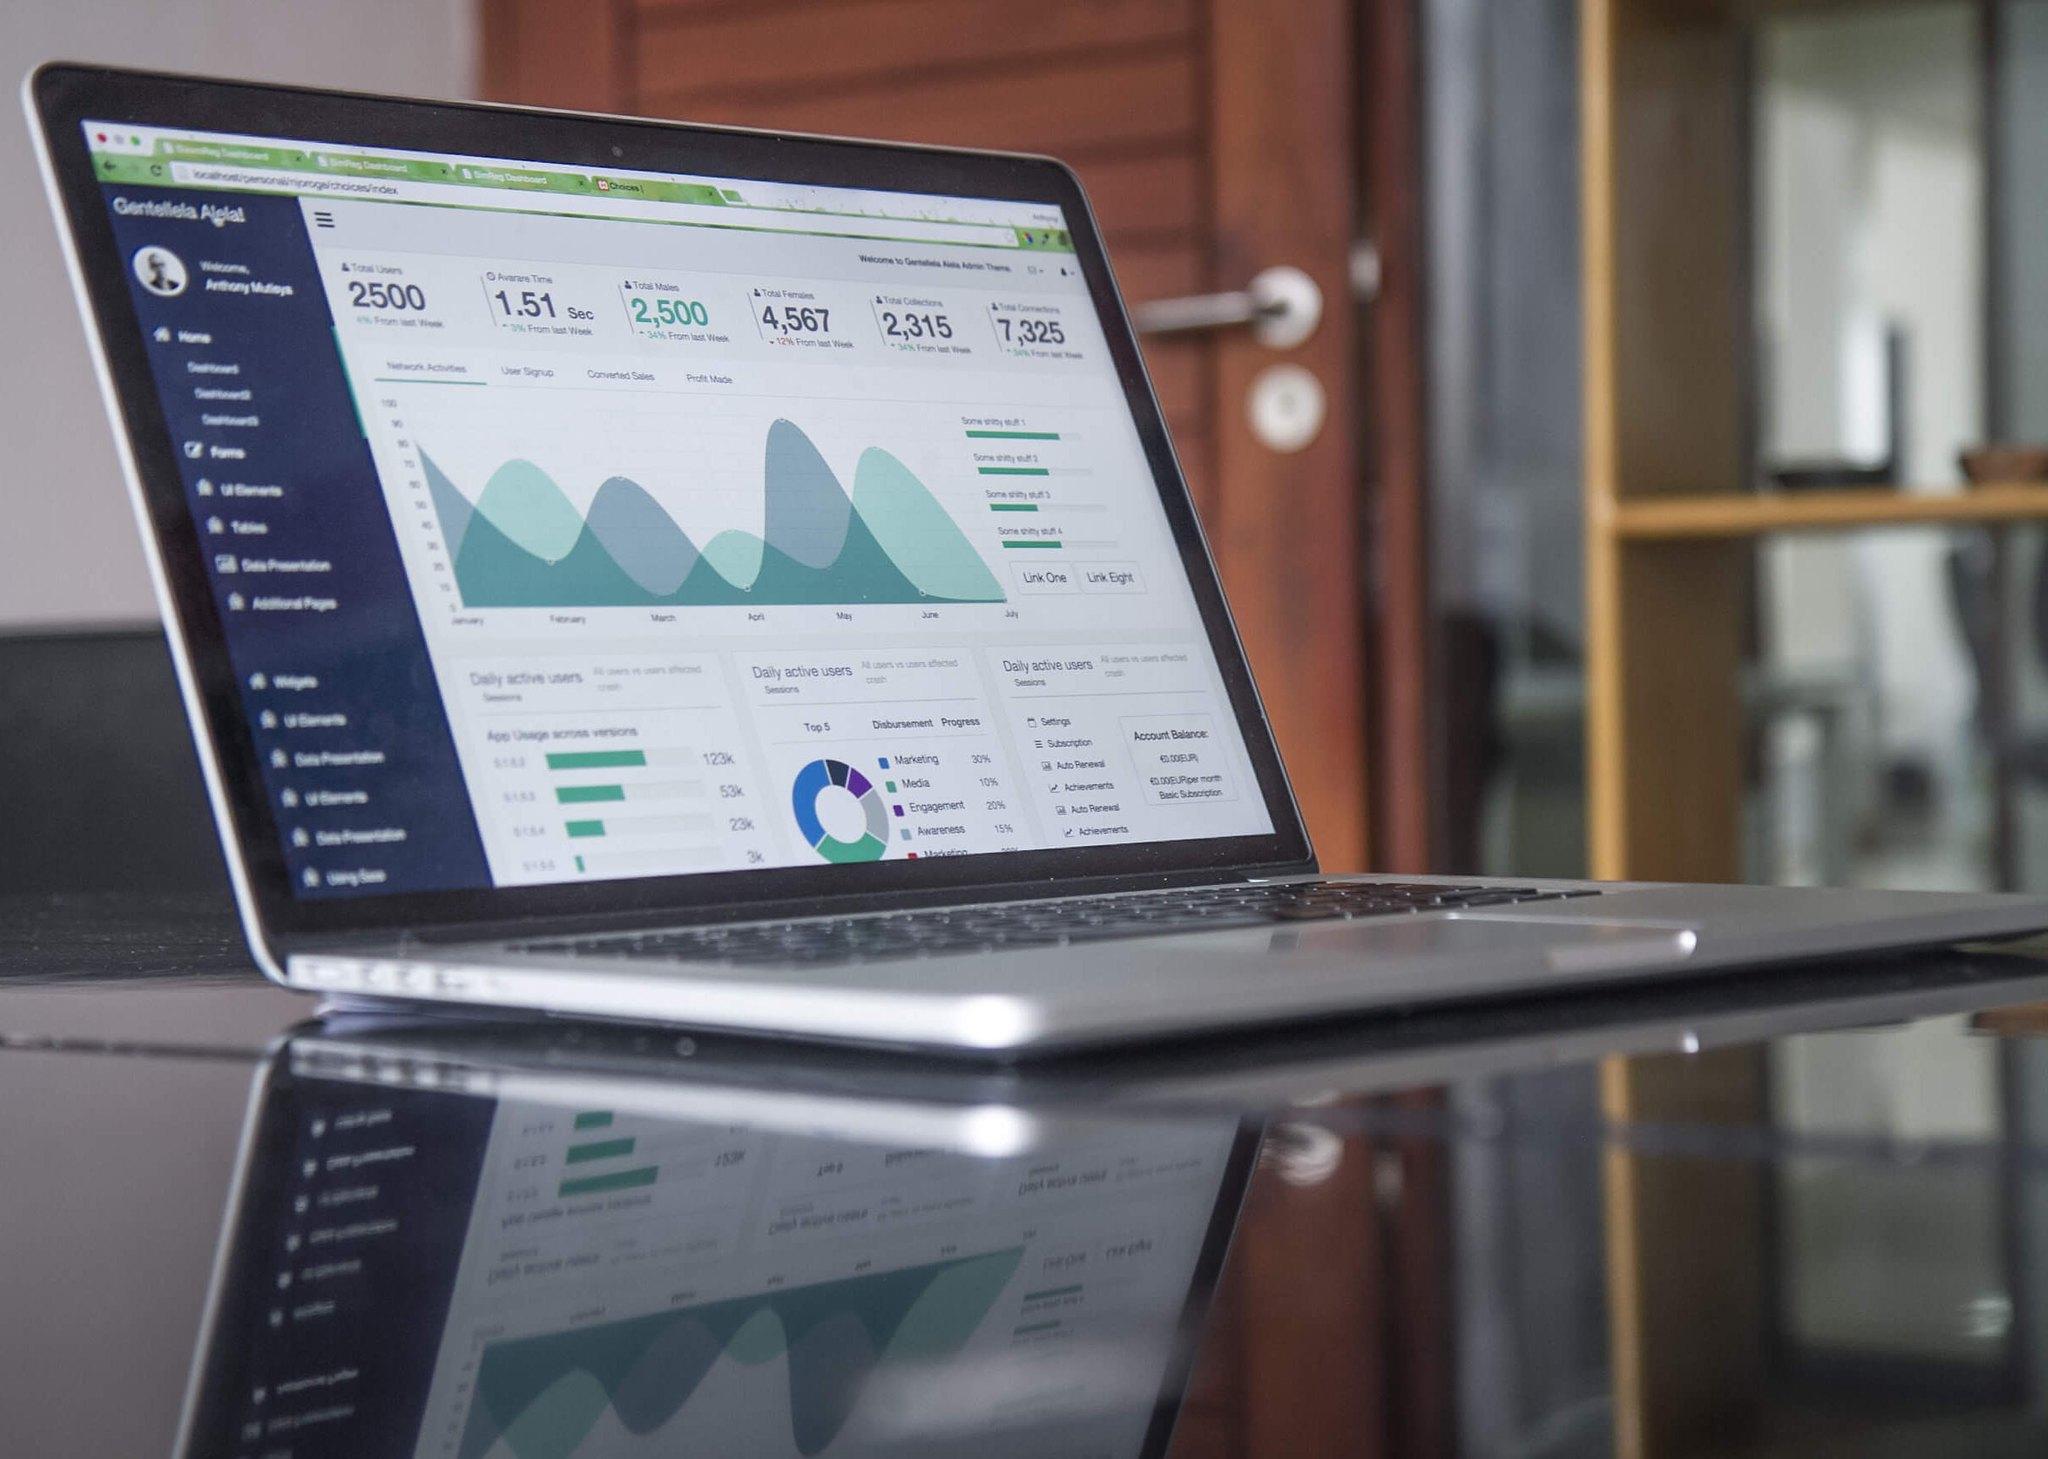 Image of Google Analytics page on laptop